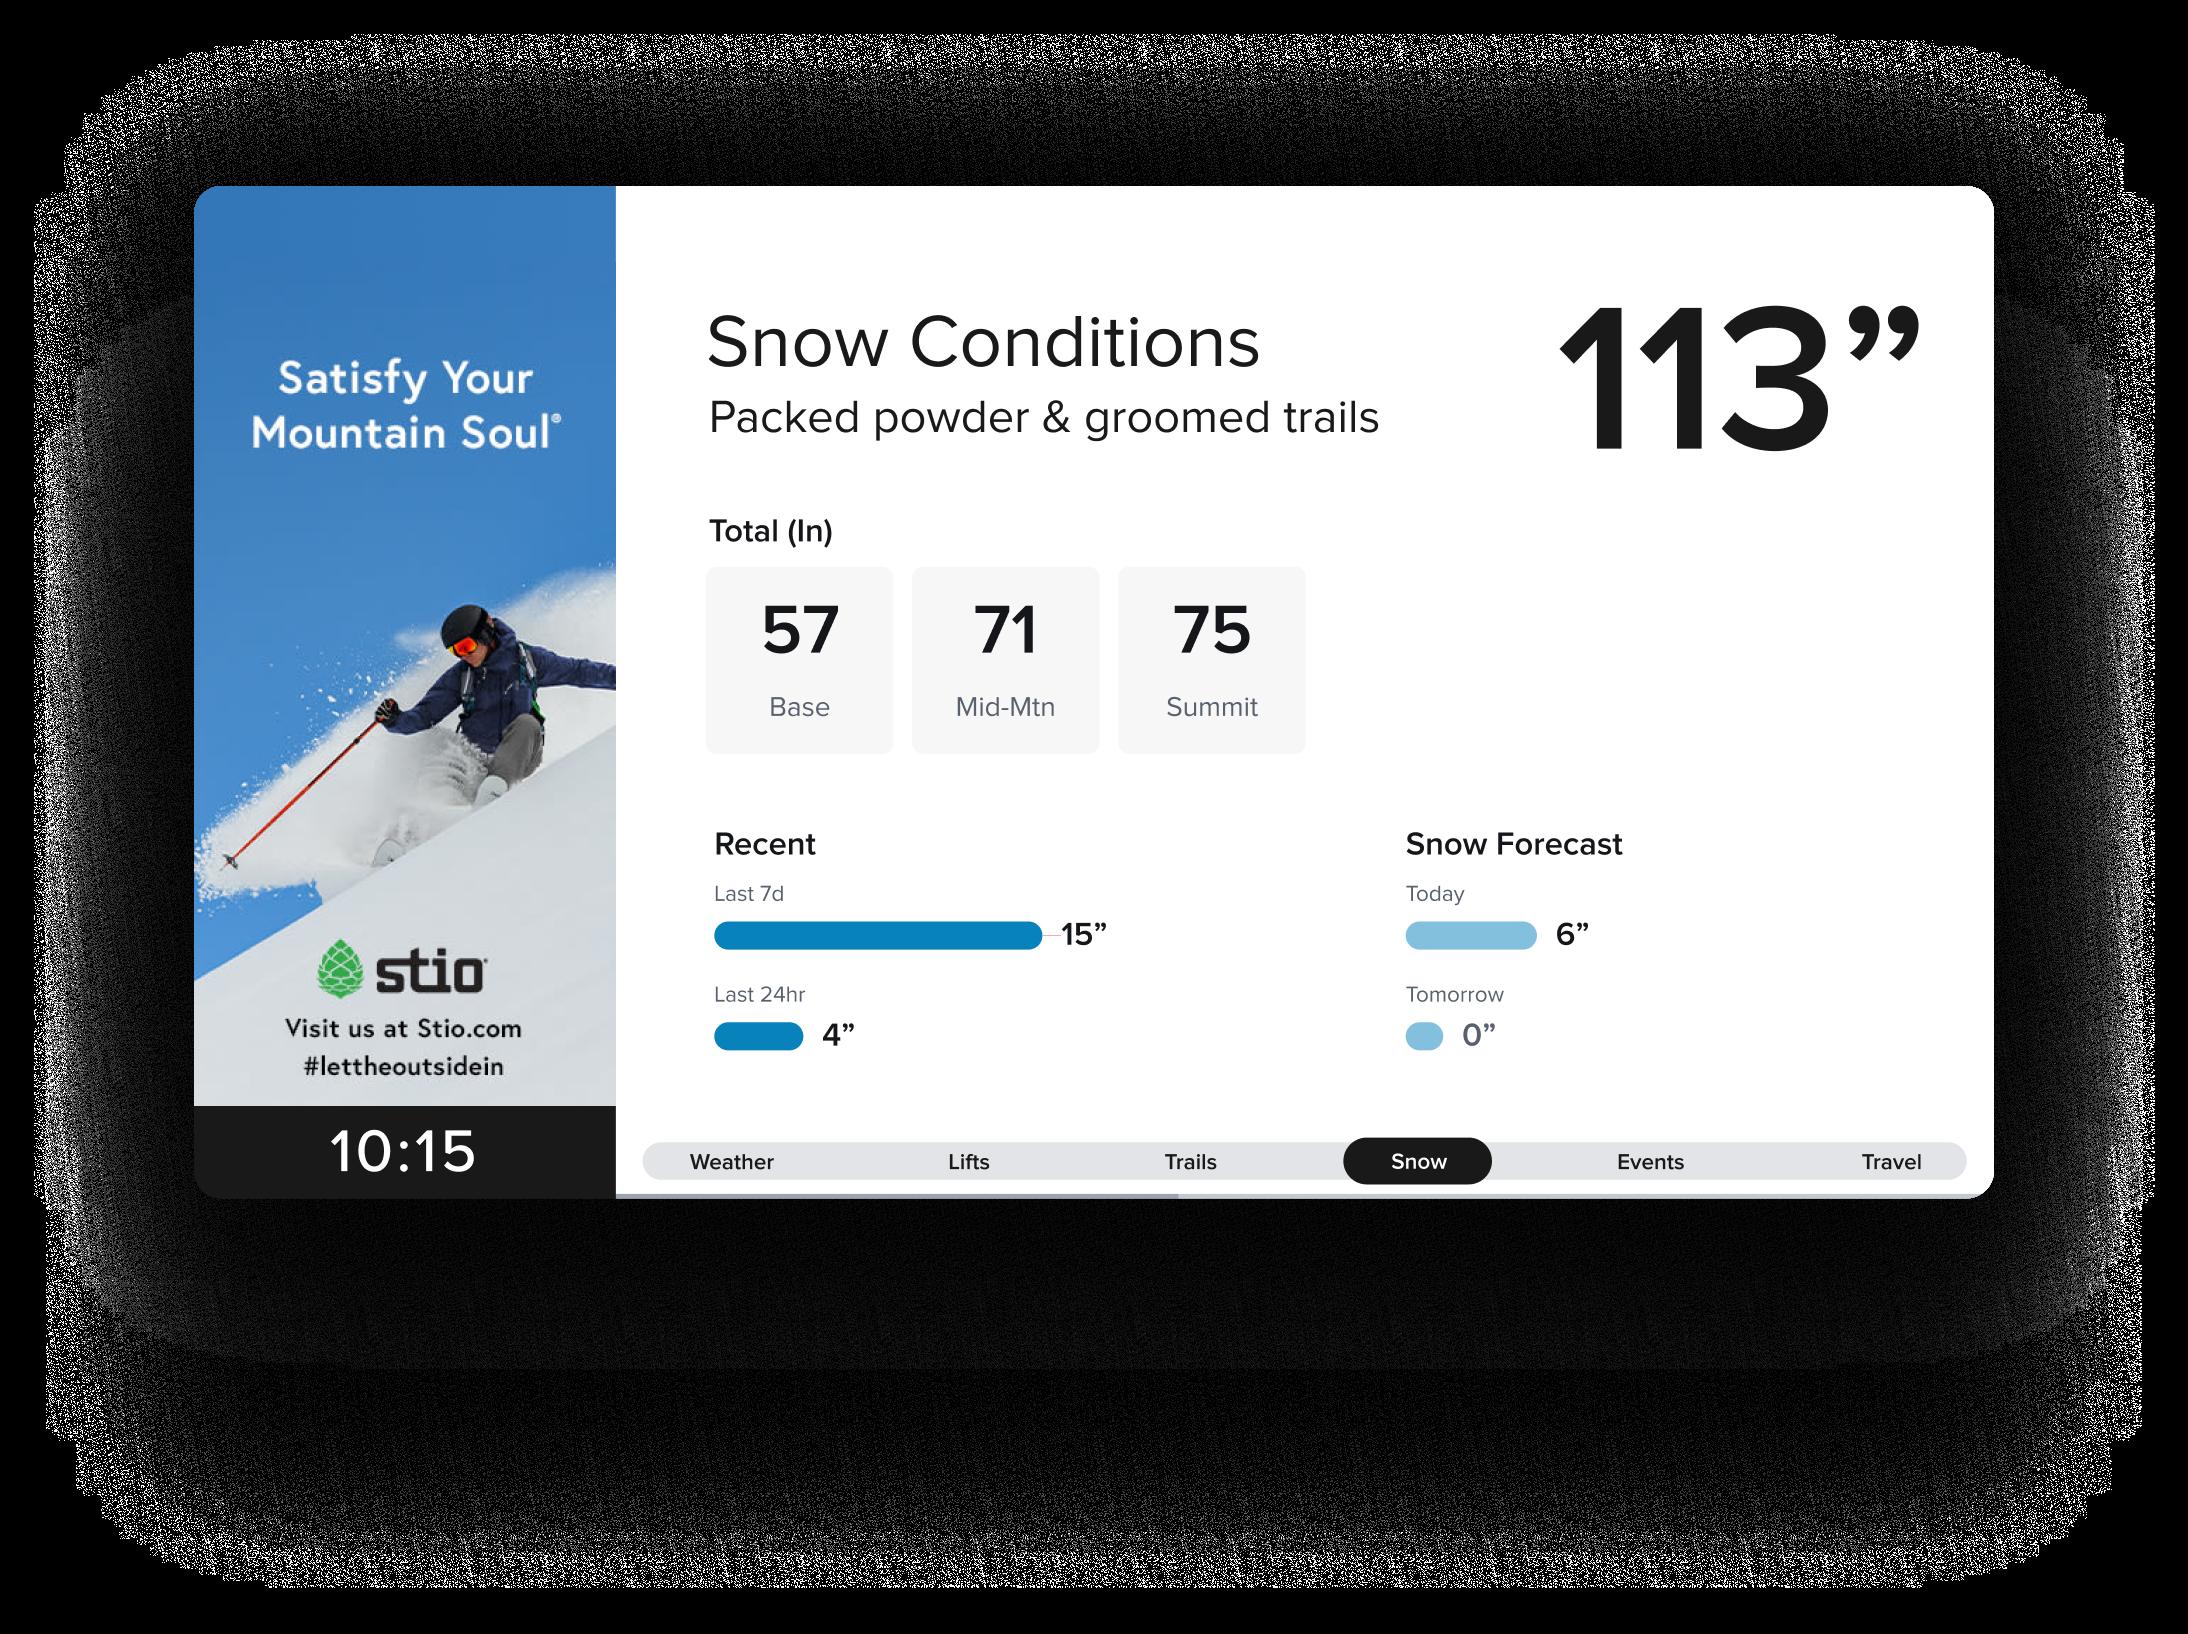 Alpine Media - Winter Park display - Snow Conditions - Stio